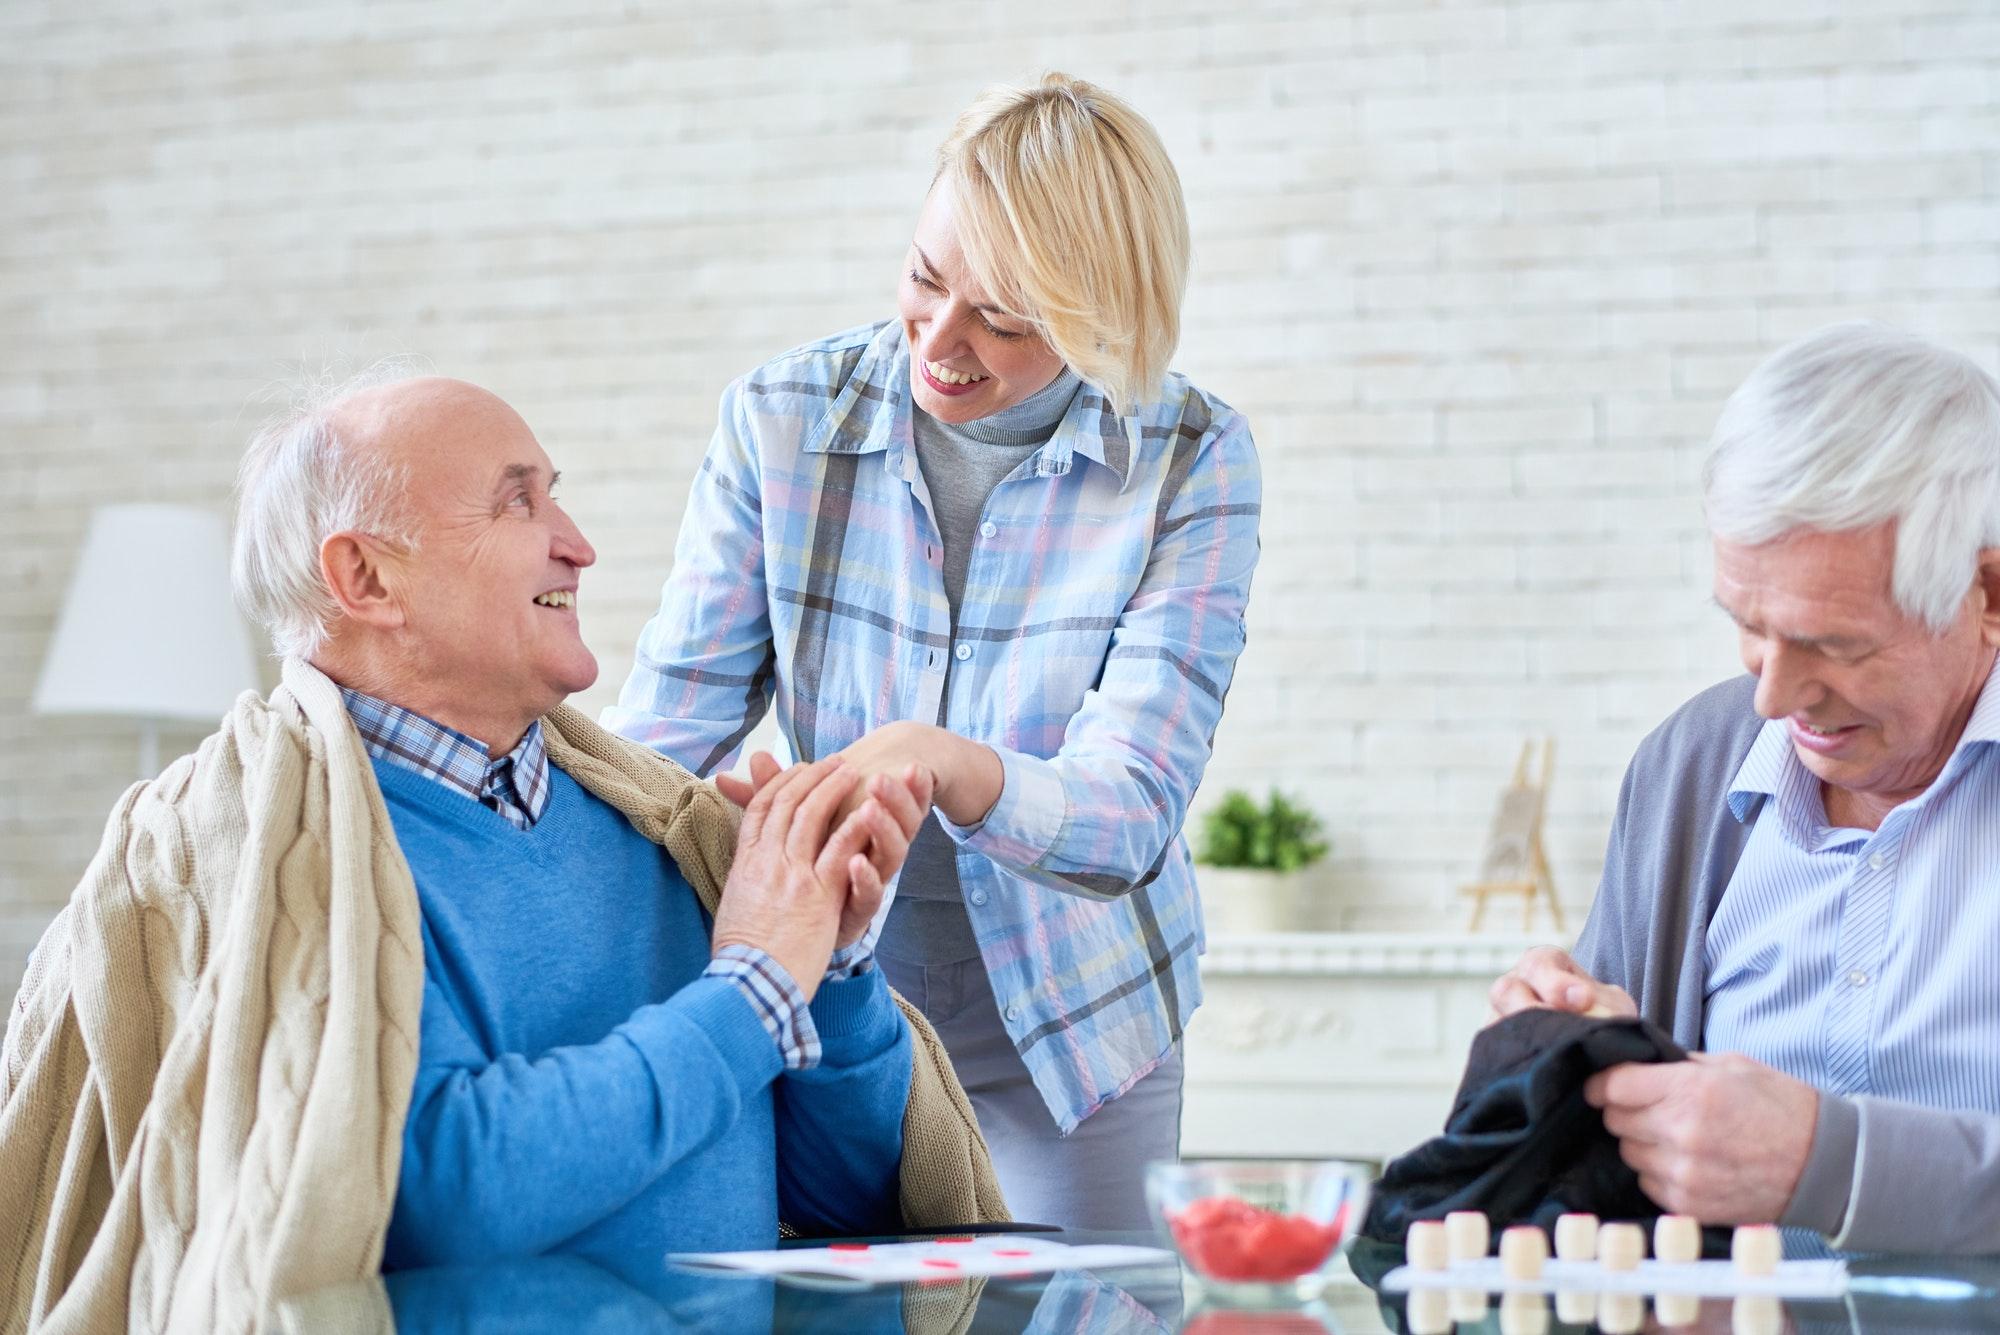 Seniors in Retirement Home